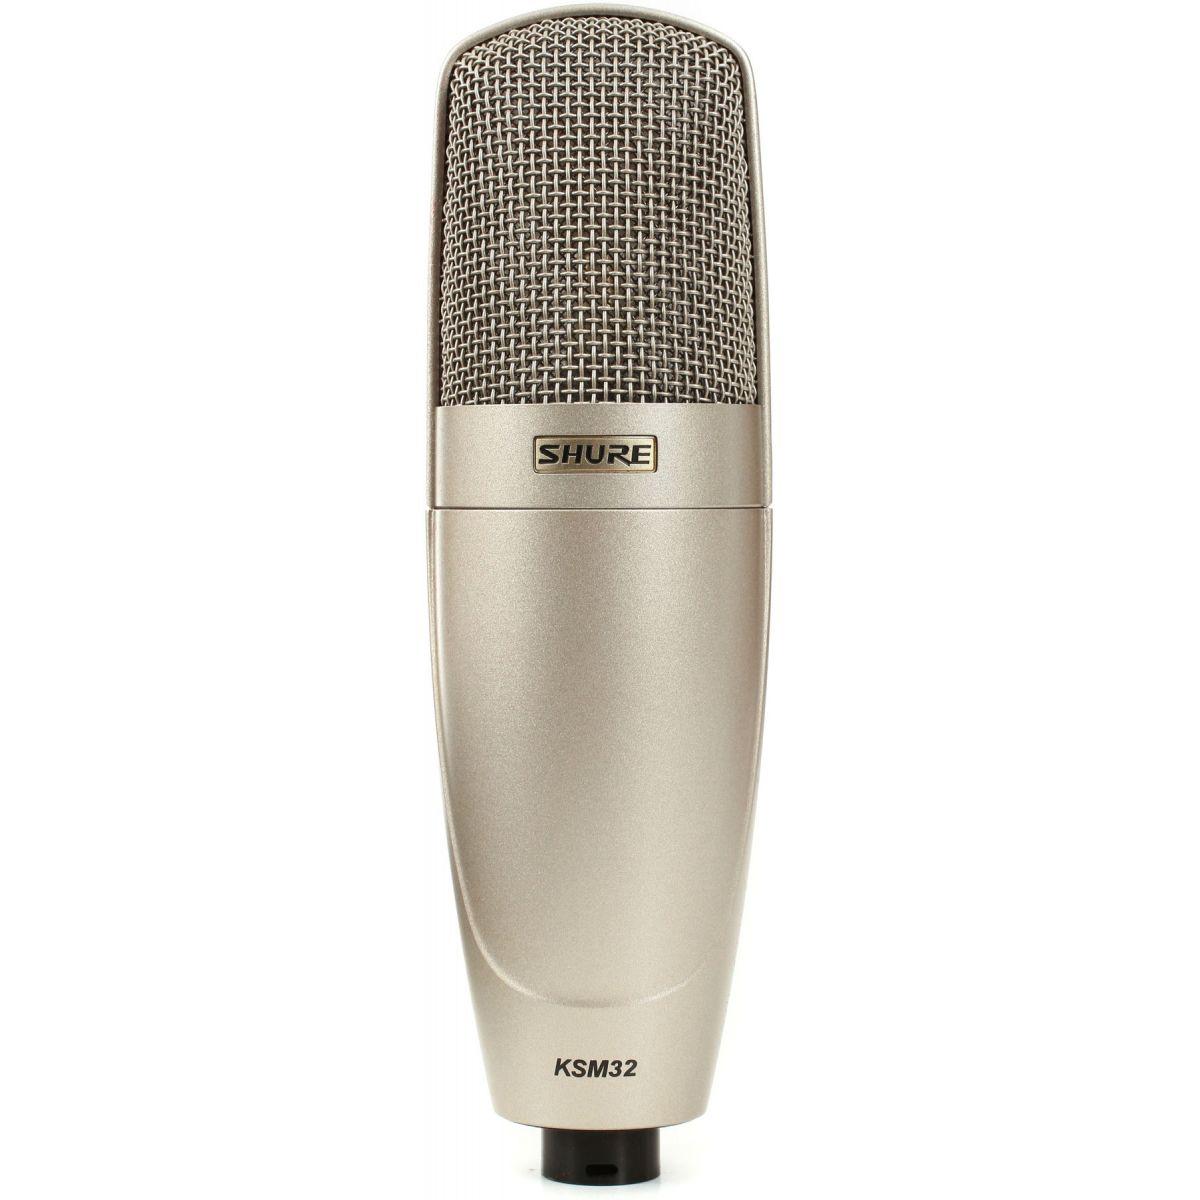 Shure KSM32/SL Microfone Condensador, Cardióide, Estúdio